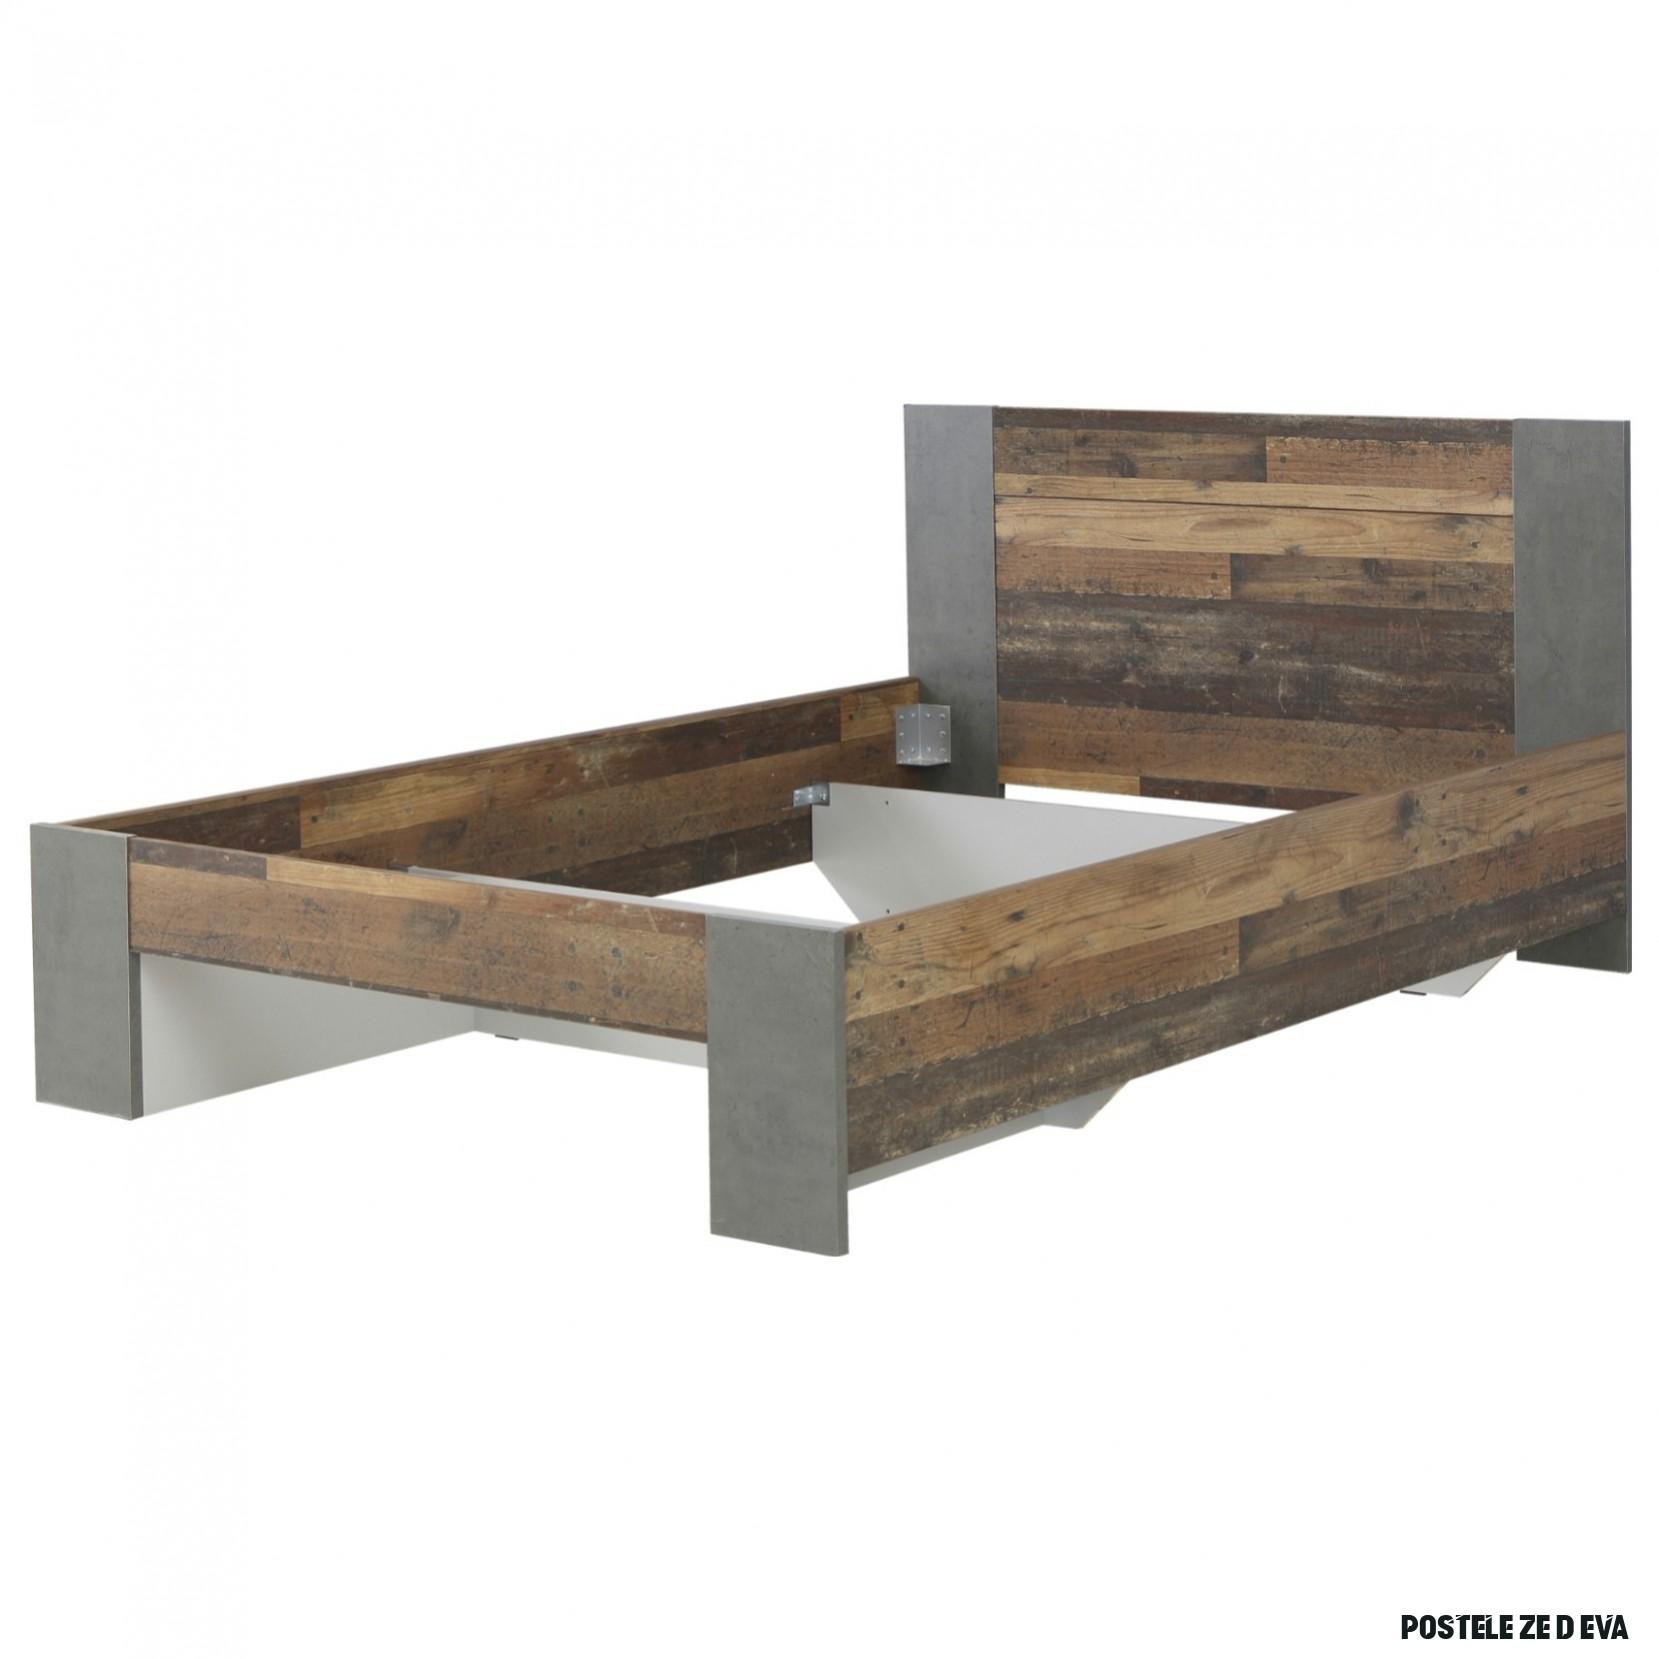 Postel CLIF staré dřevo/šedá, 15x15 cm  Sconto